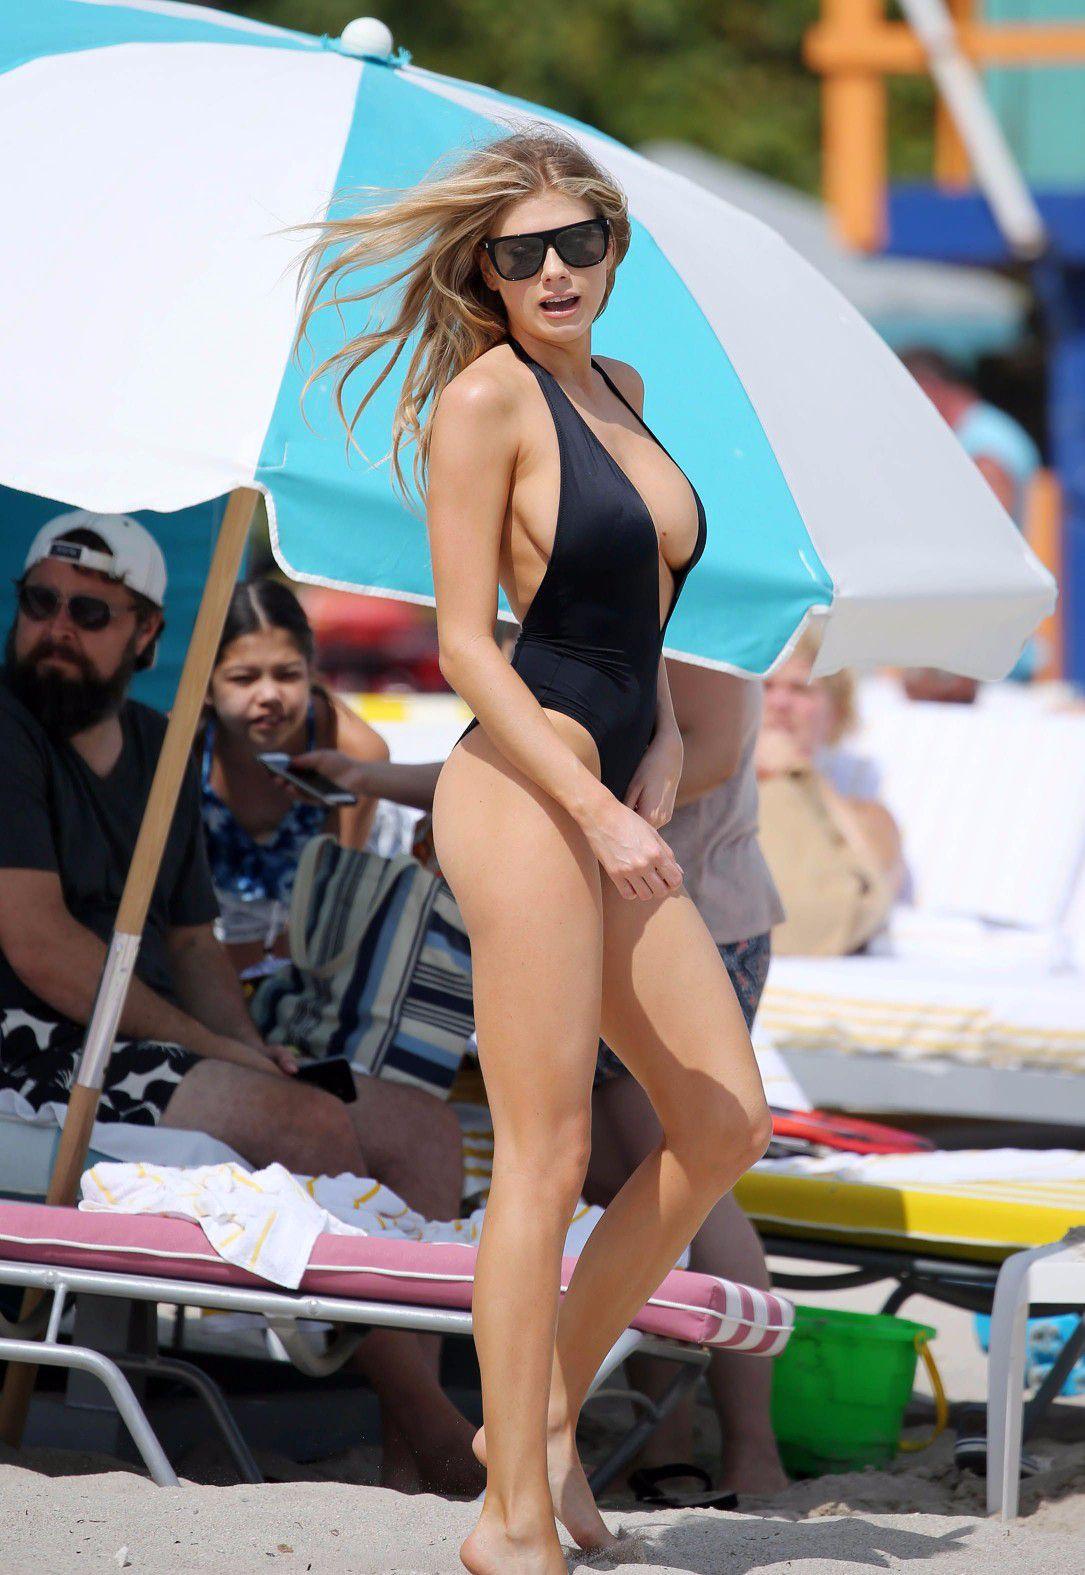 charlotte-mckinney-nipple-slip-at-the-beach-in-miami-08